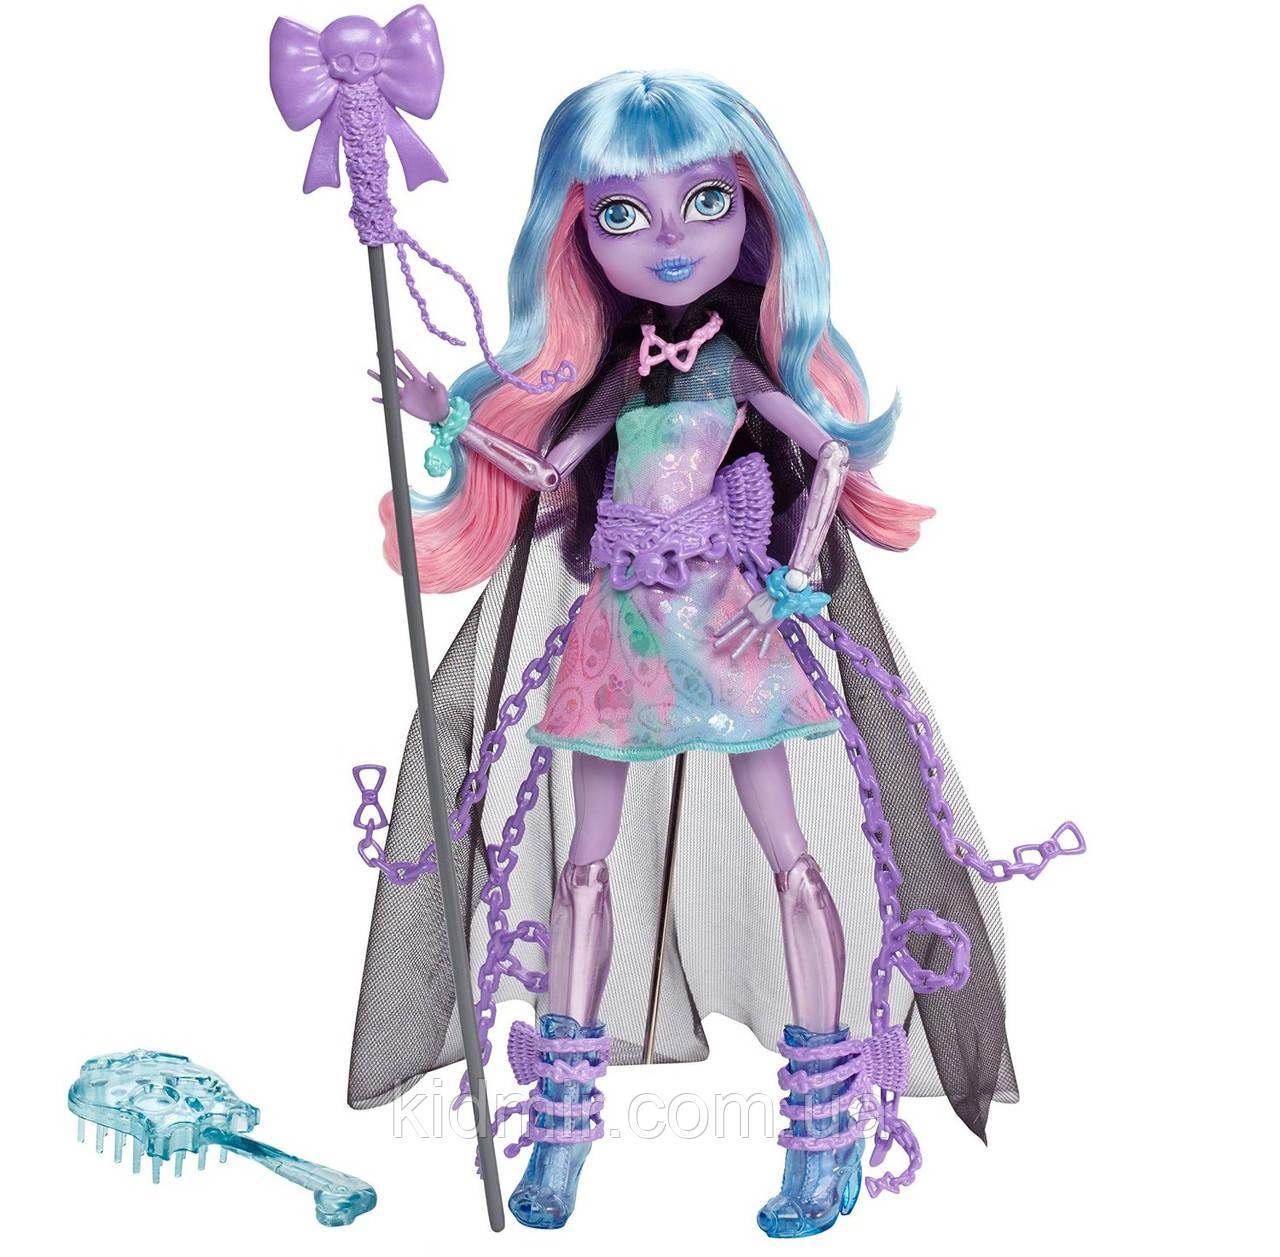 Кукла Monster High Ривер Стикс (River Styxx) из серии Haunted Student Spirits Монстр Хай